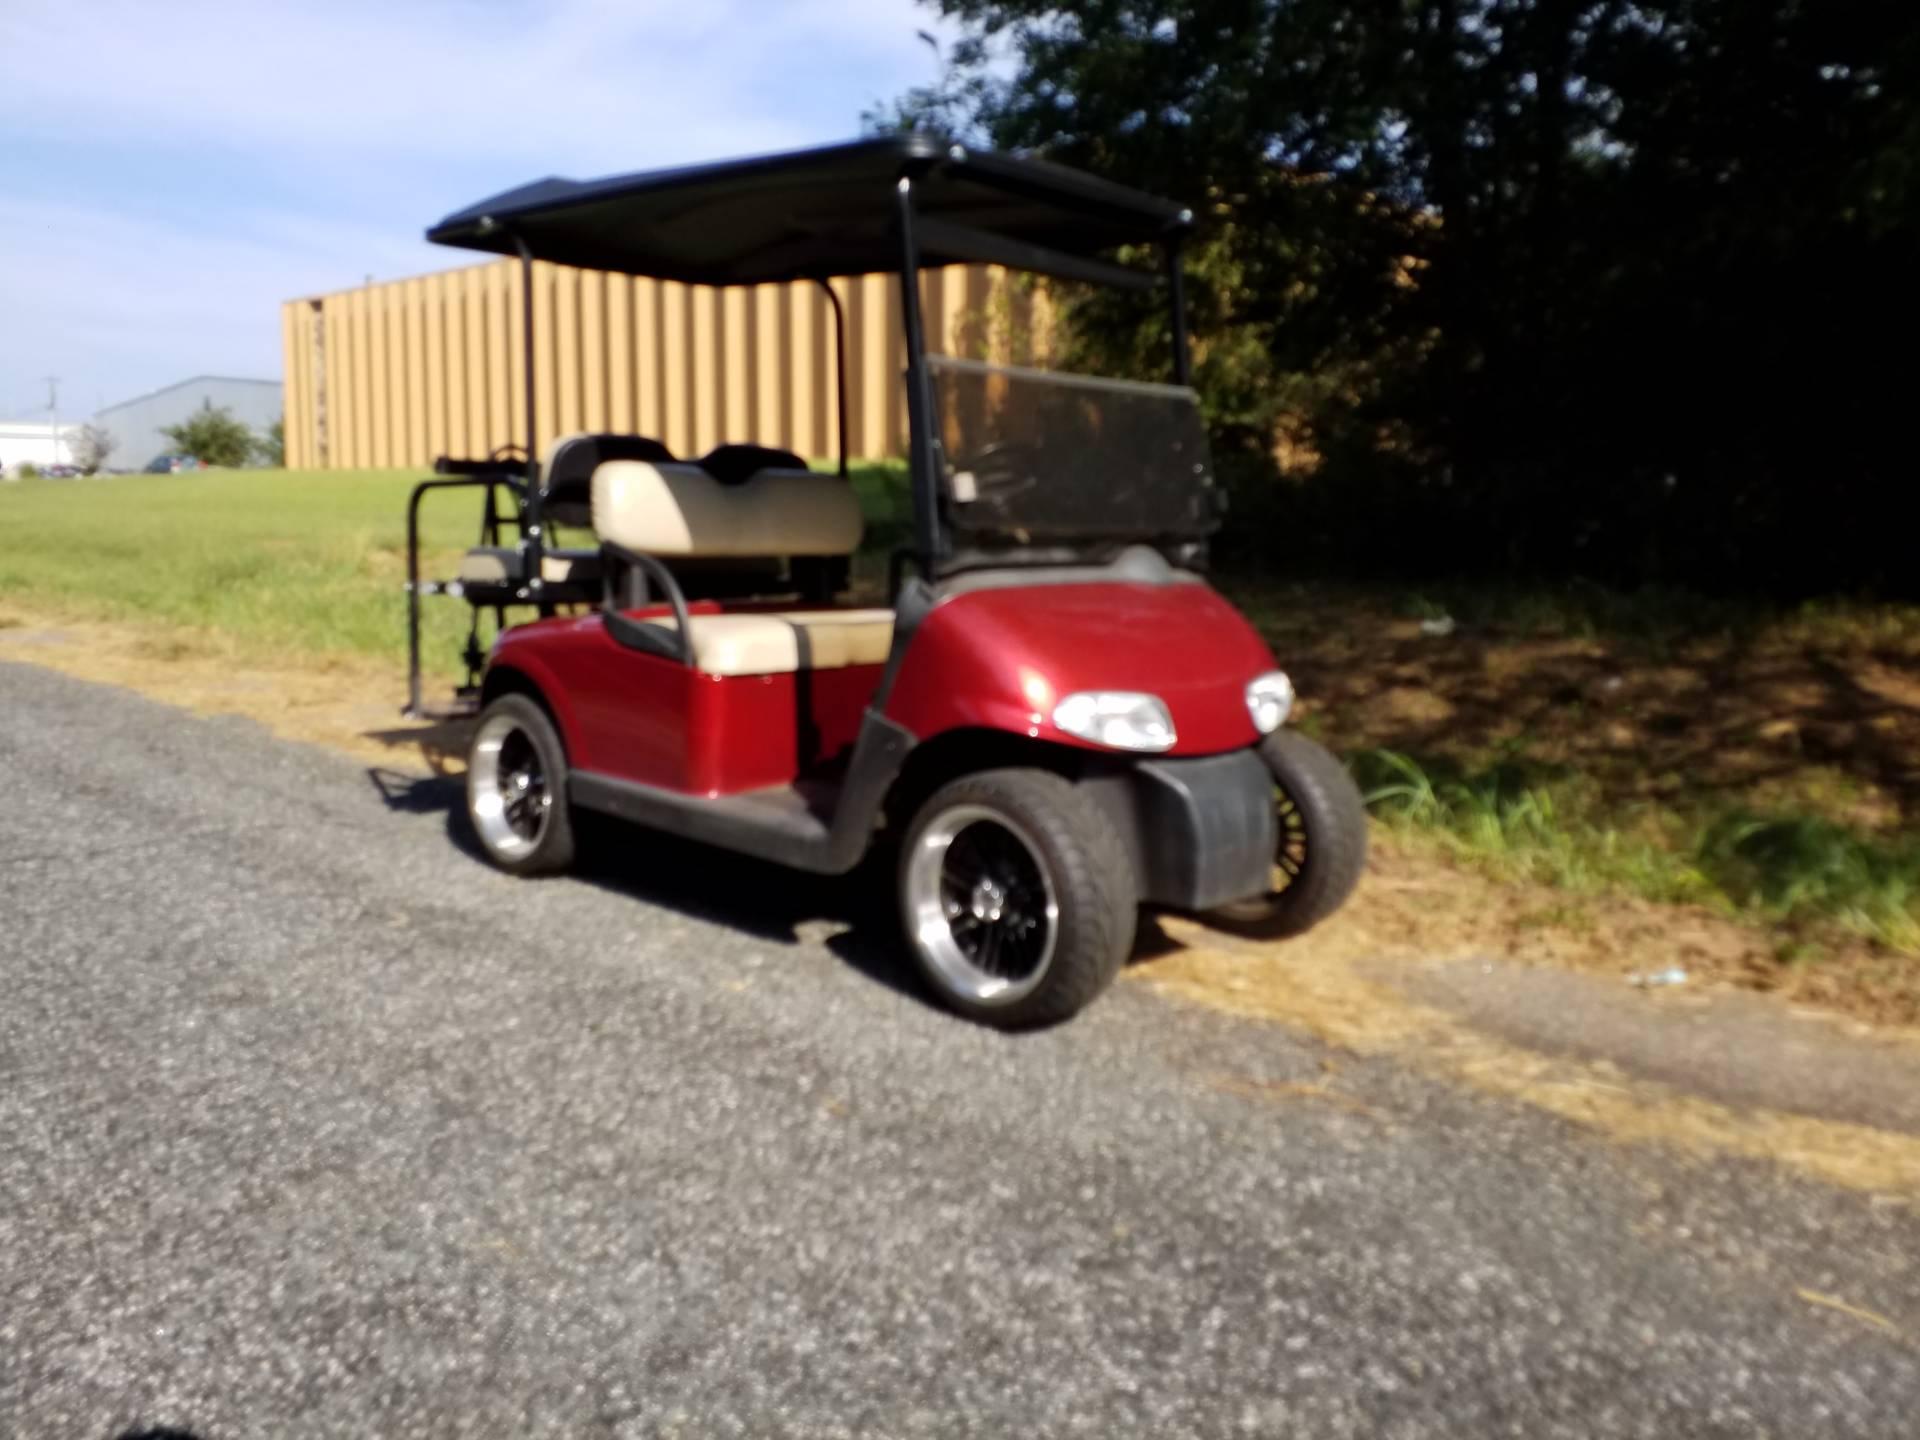 2009 Ezgo Rxv 48v Free Download Wiring Diagram New E Z Go Freedom Electric Golf Carts In Covington Ga